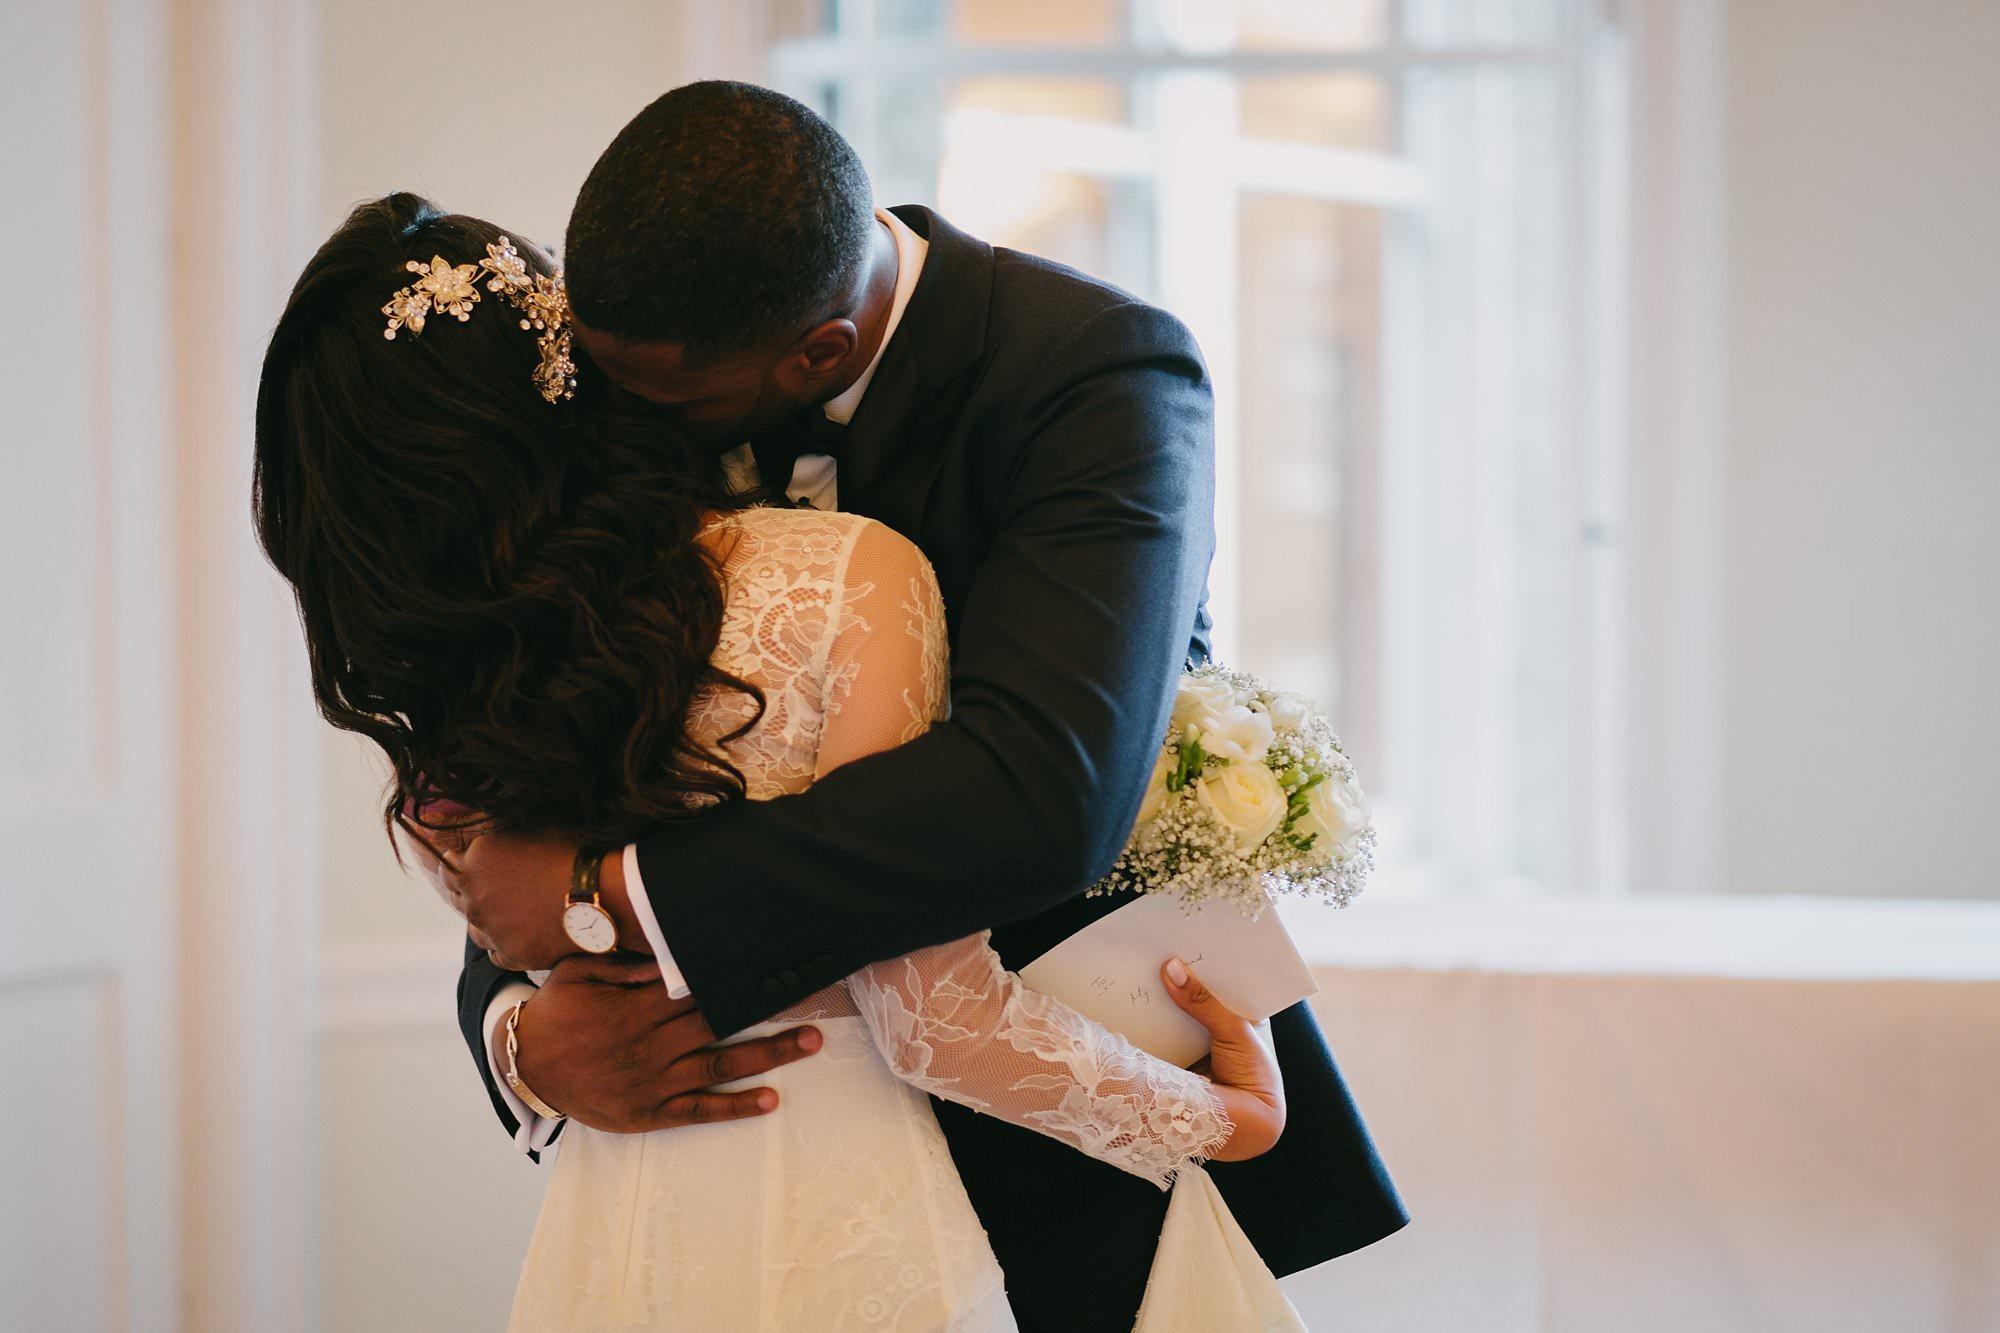 asia house london wedding photographer 003 - Rachel + Gabriel   Asia House Wedding Photography